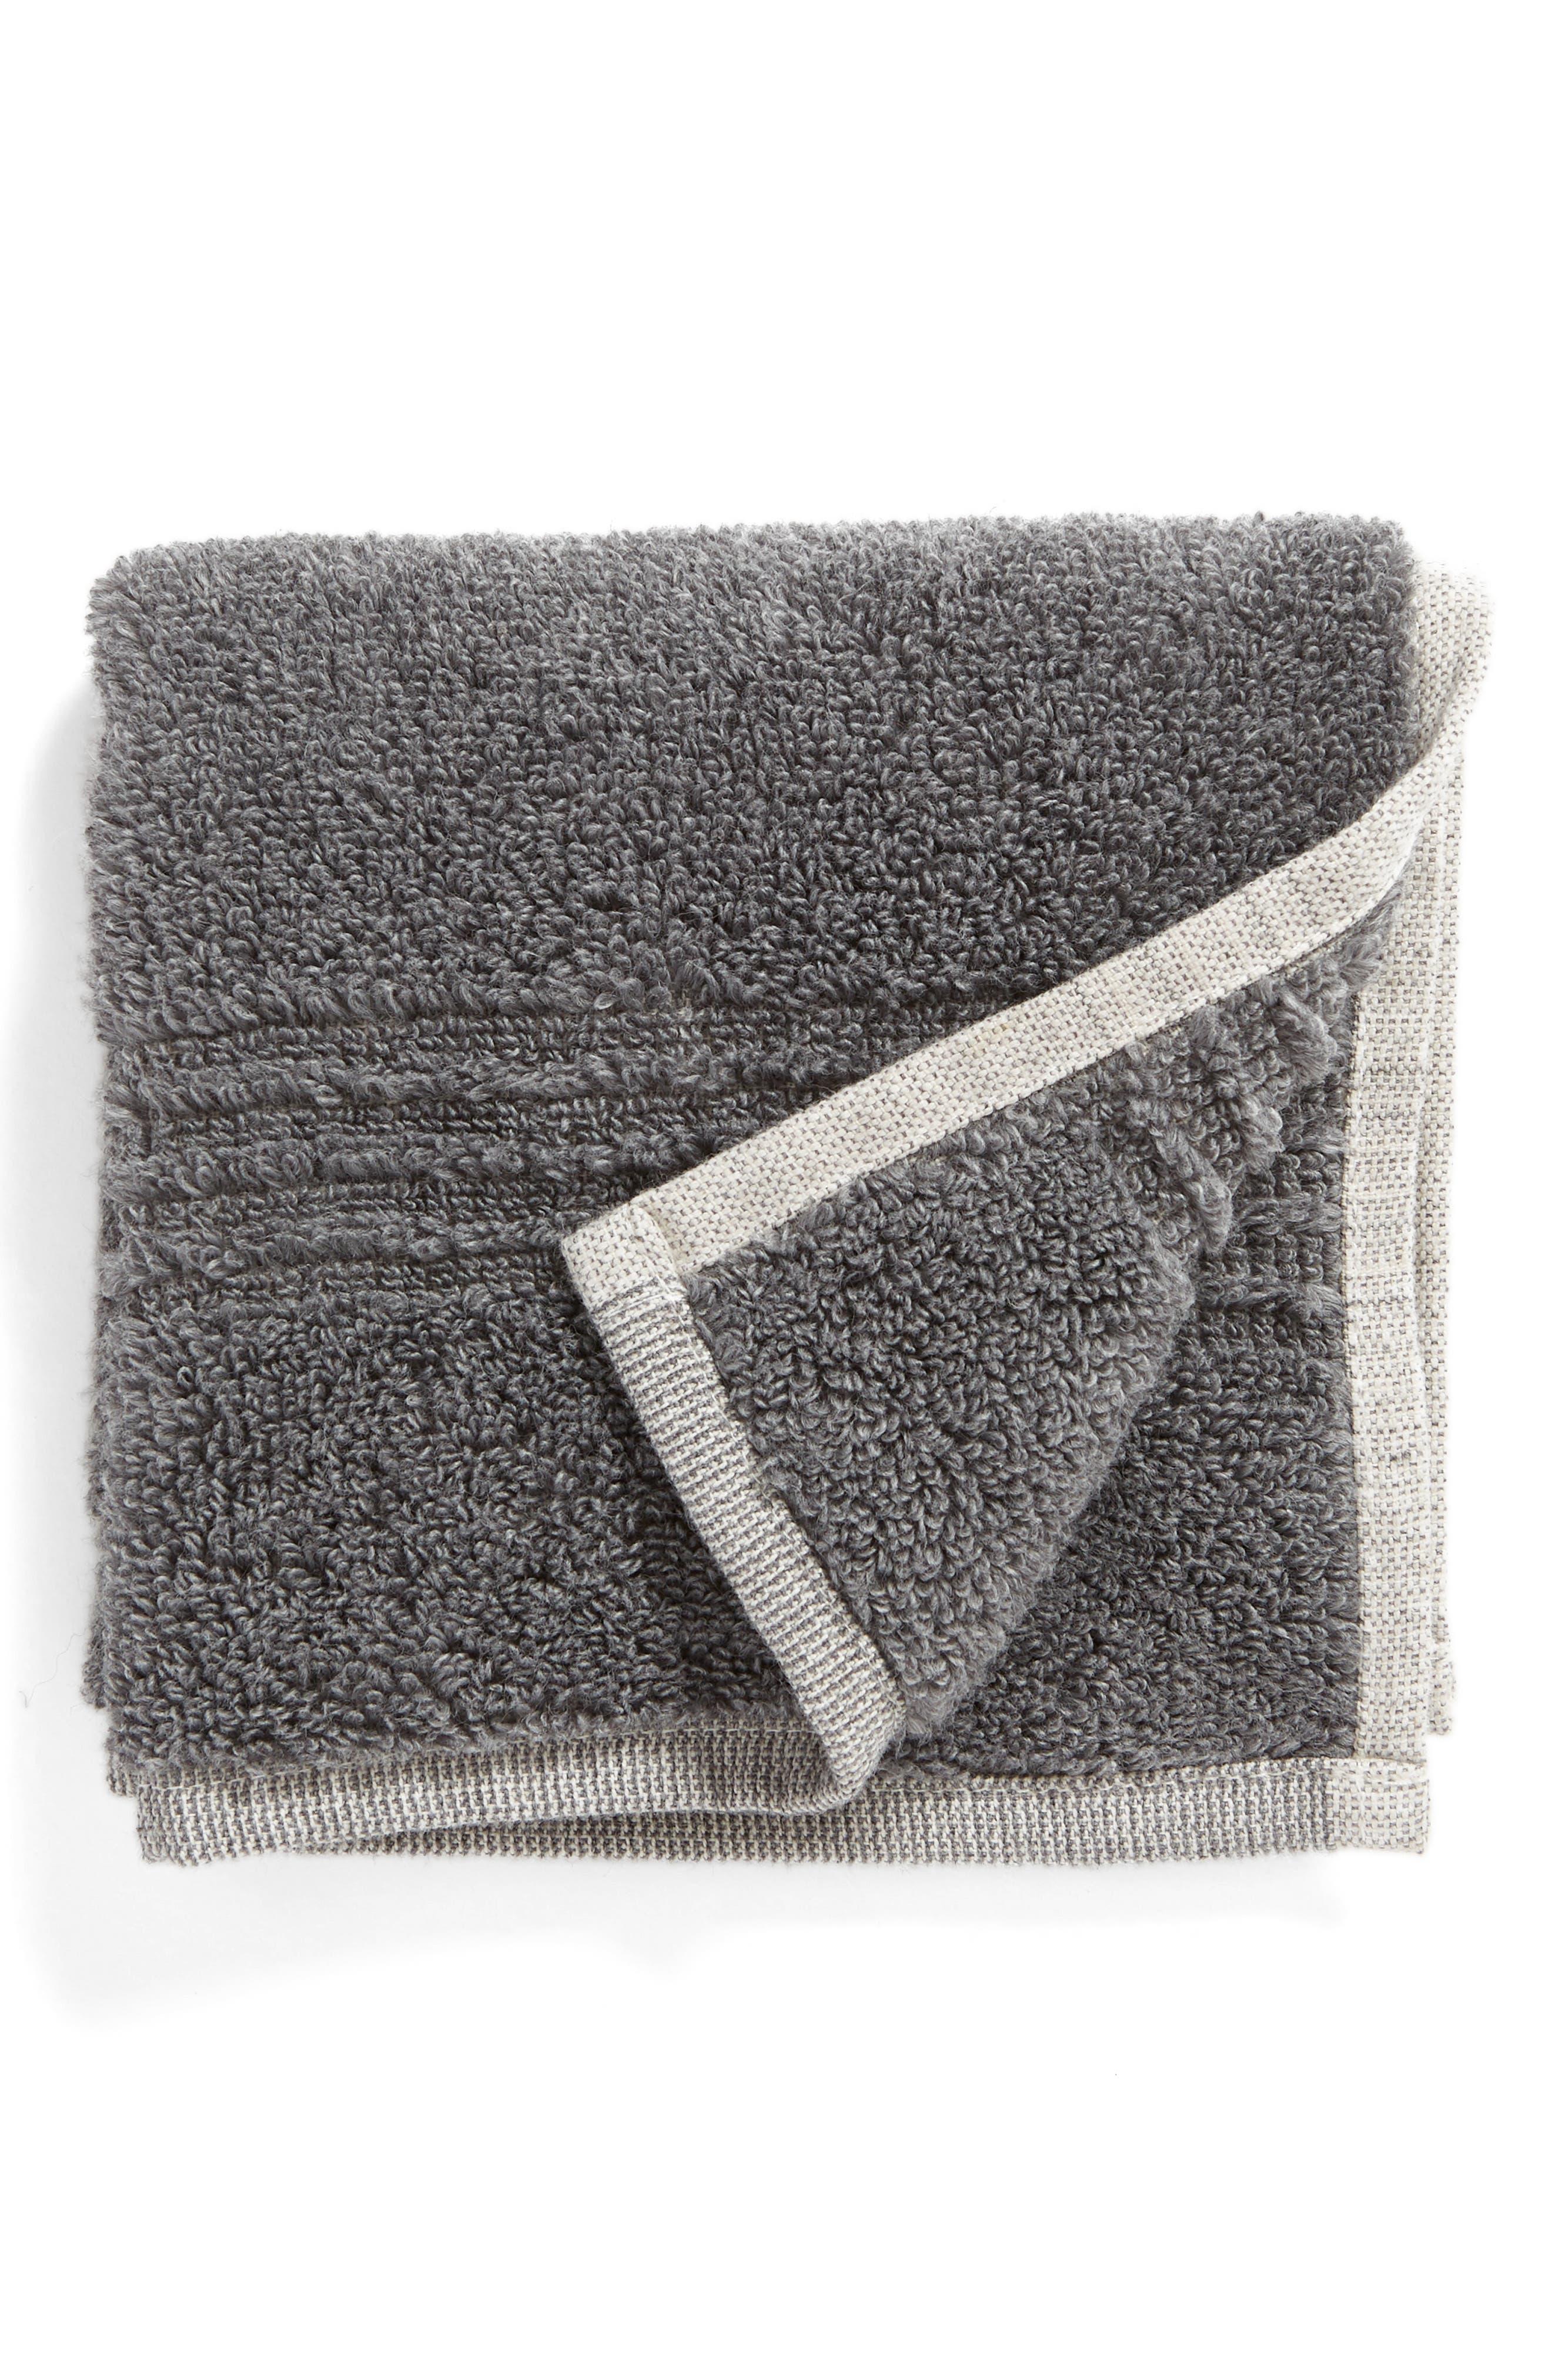 Organic Hydrocotton Washcloth,                         Main,                         color, GREY PEARL